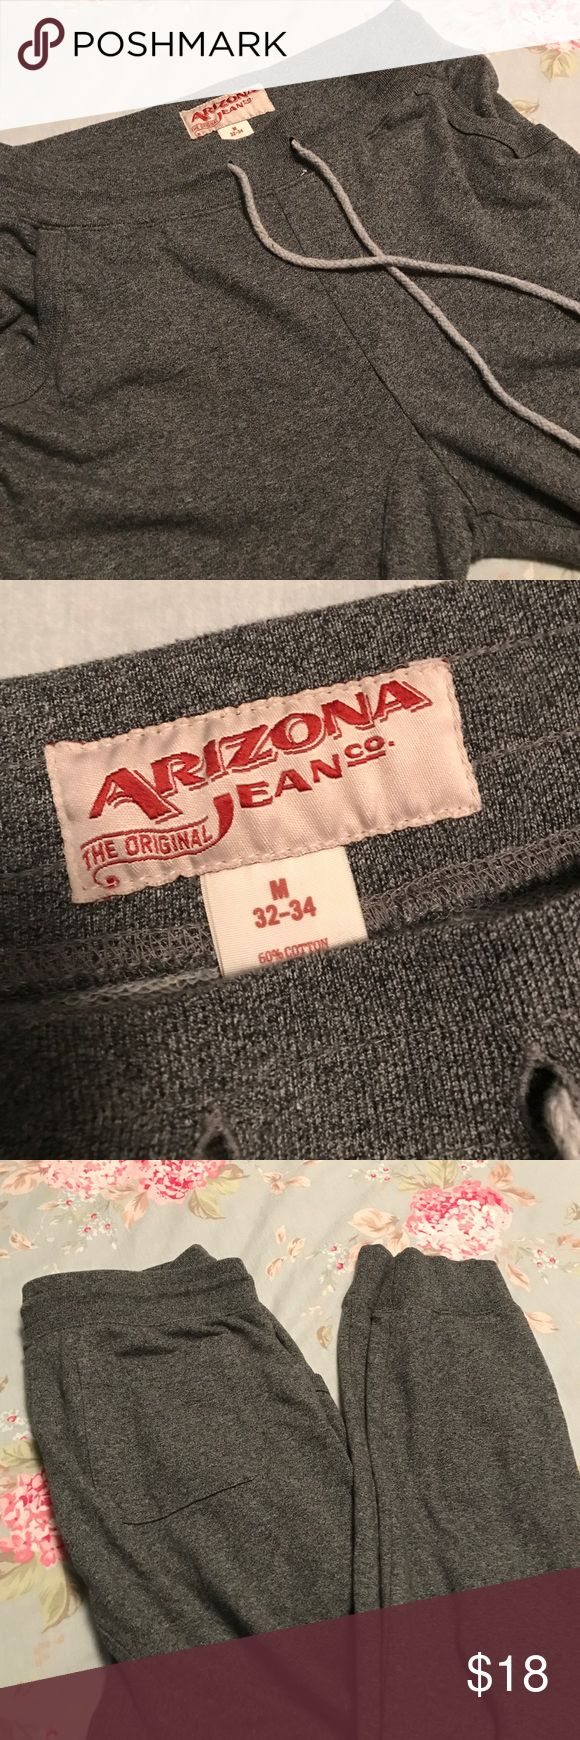 Men's joggers Men's joggers. Size medium 32/34. Offers welcome Arizona Jean Company Pants Sweatpants & Joggers